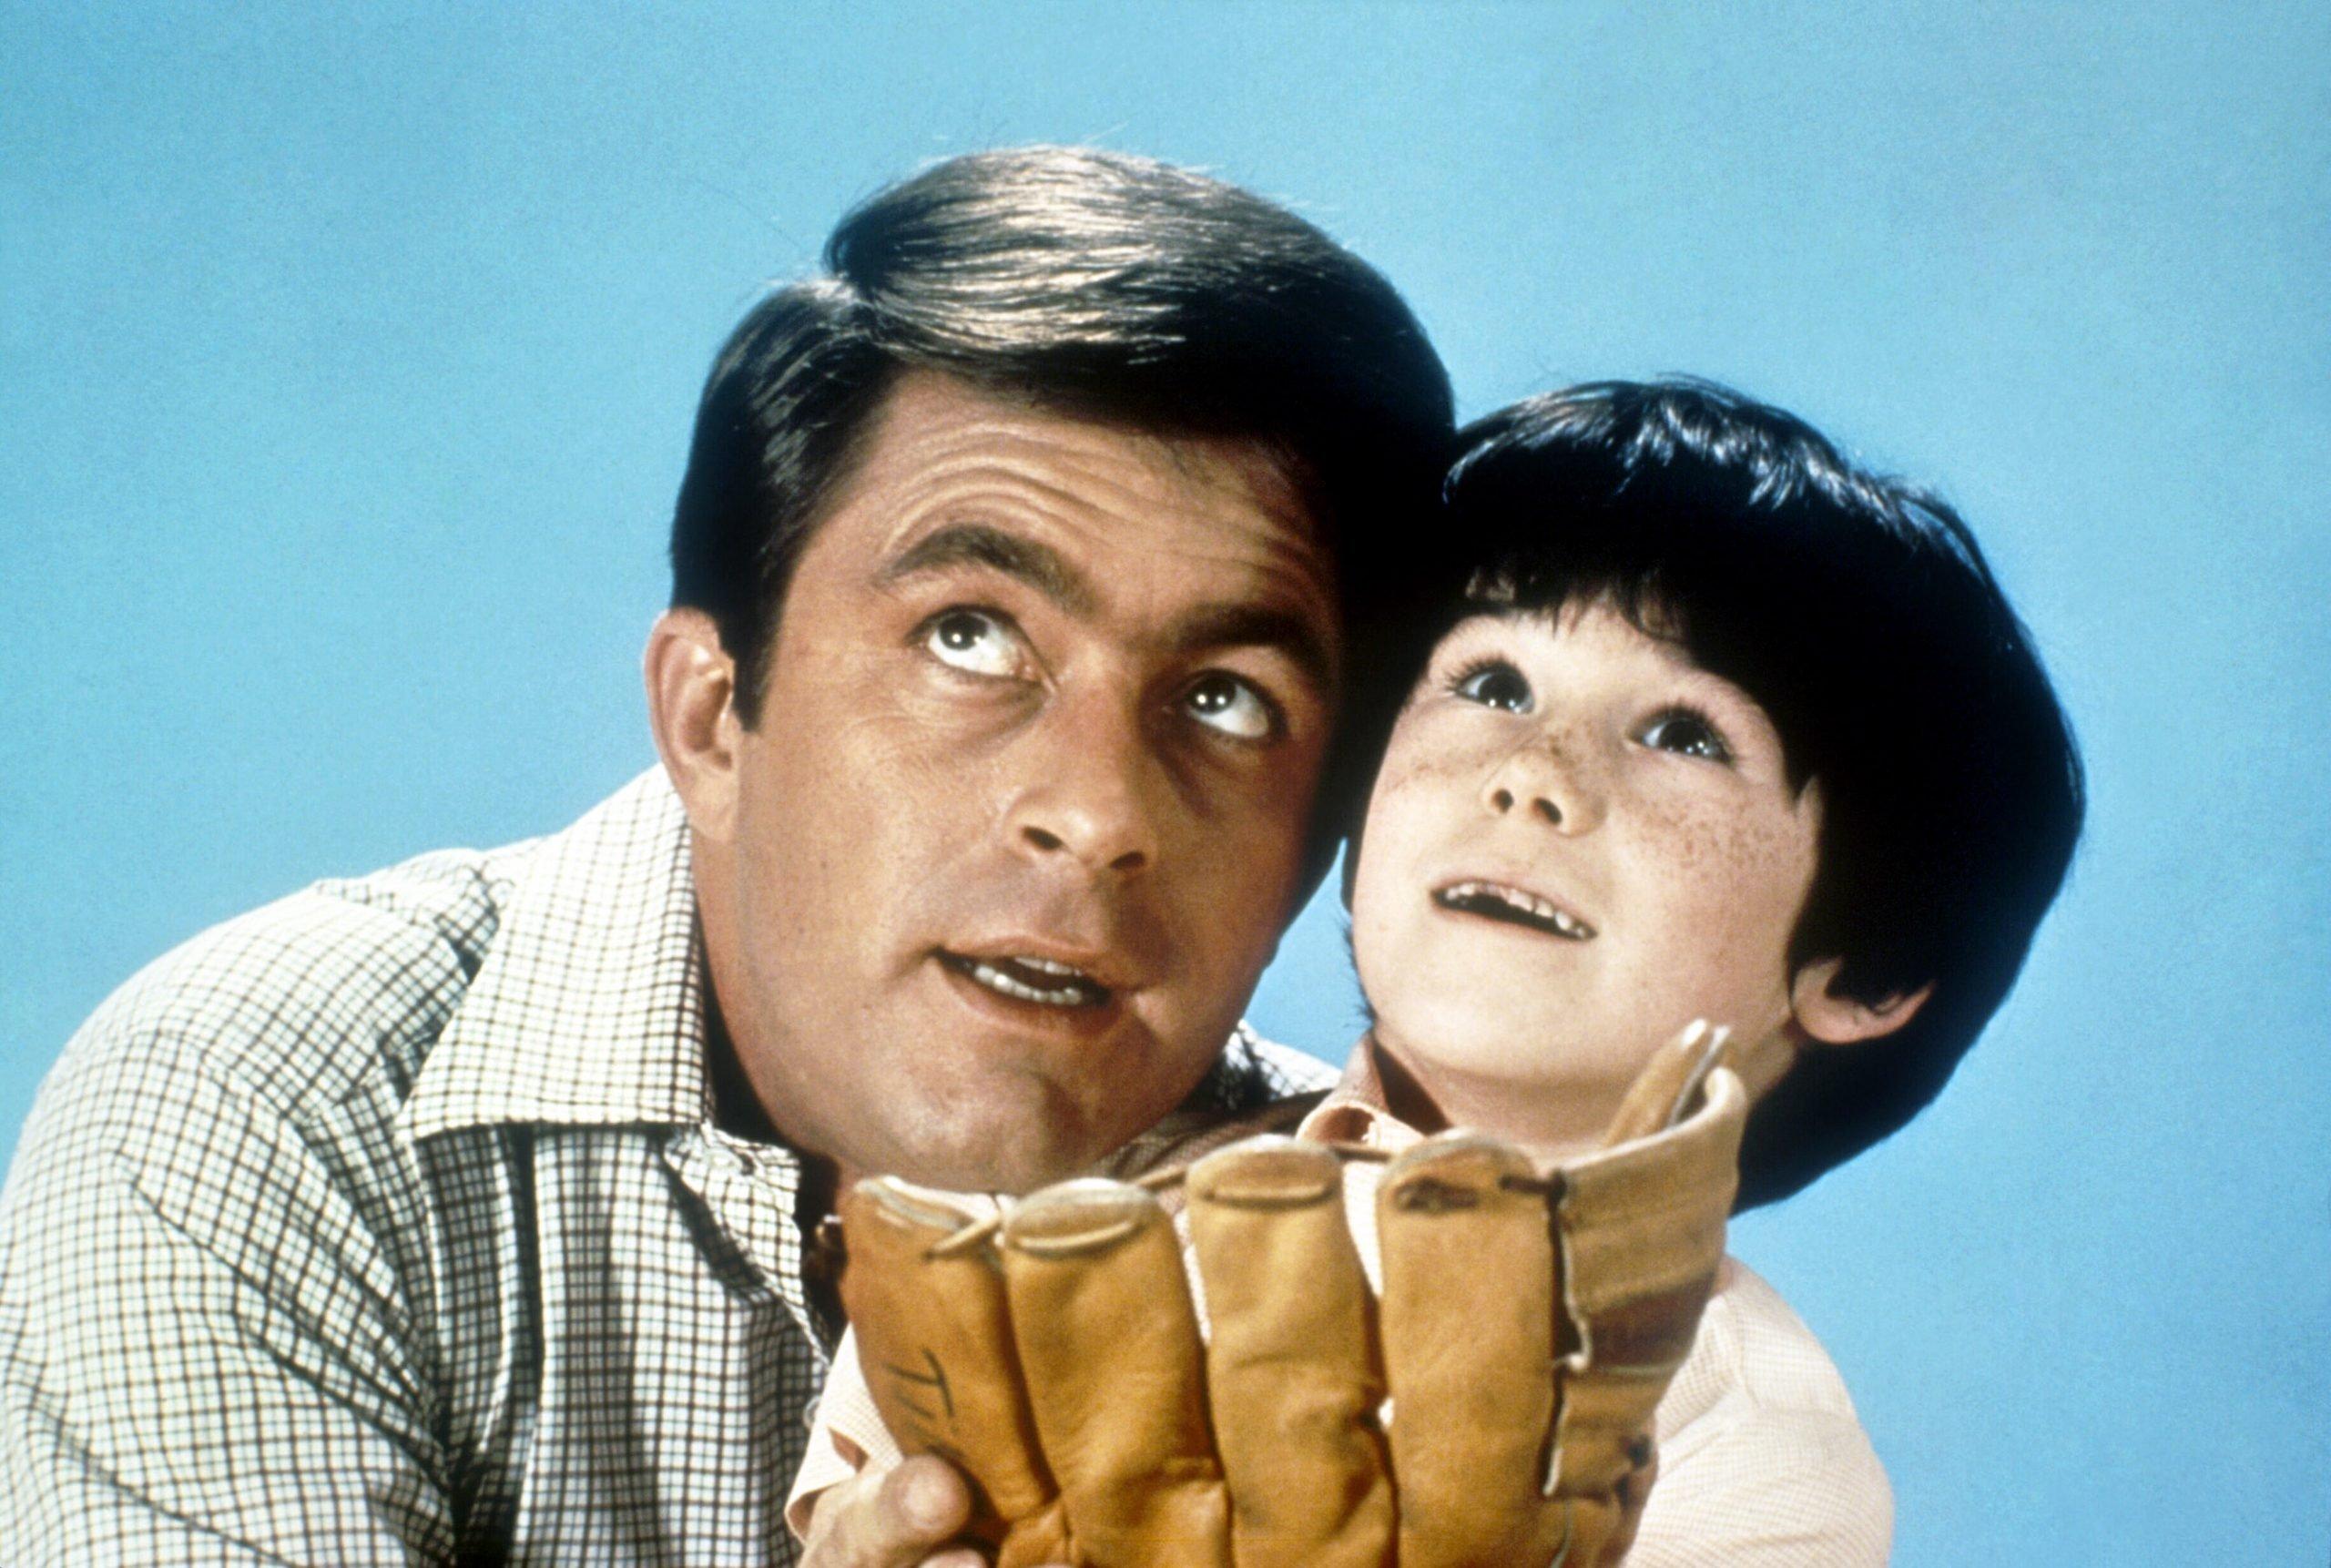 bill-bixby-brandon-cruz-the-courtship-of-eddies-father